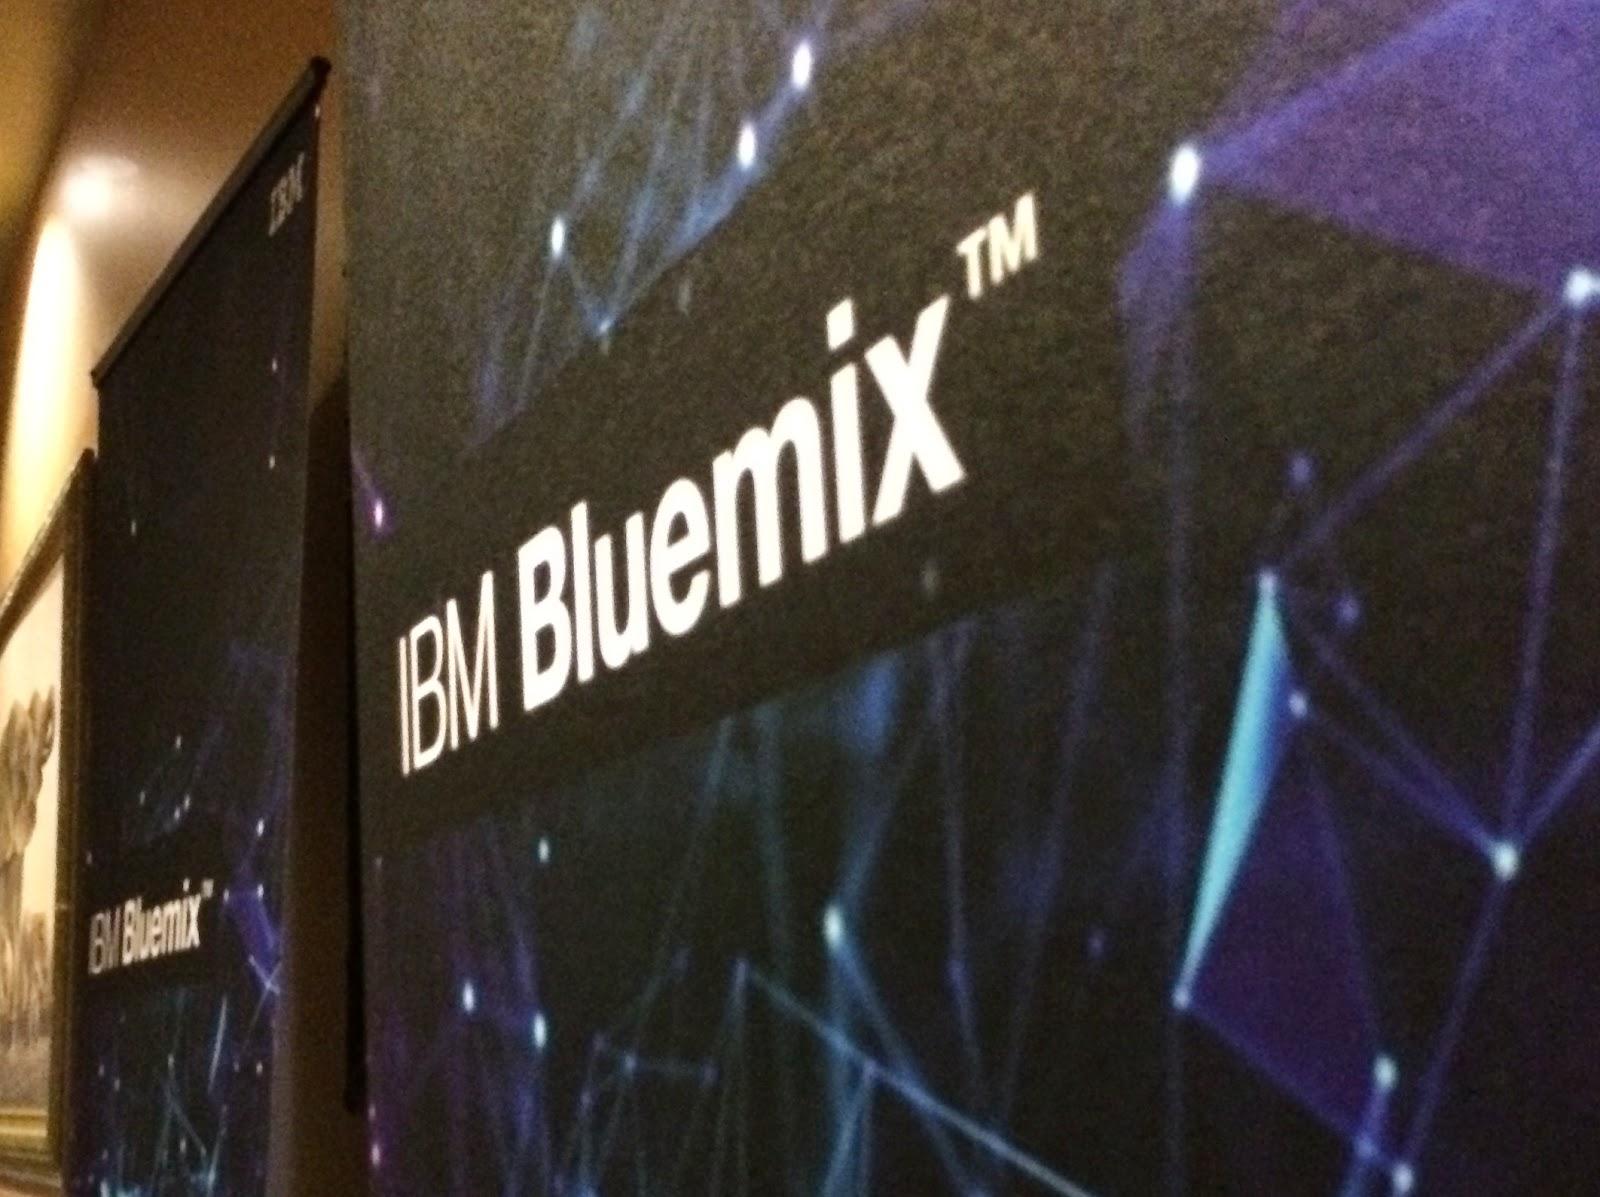 IBM Bluemix Banners